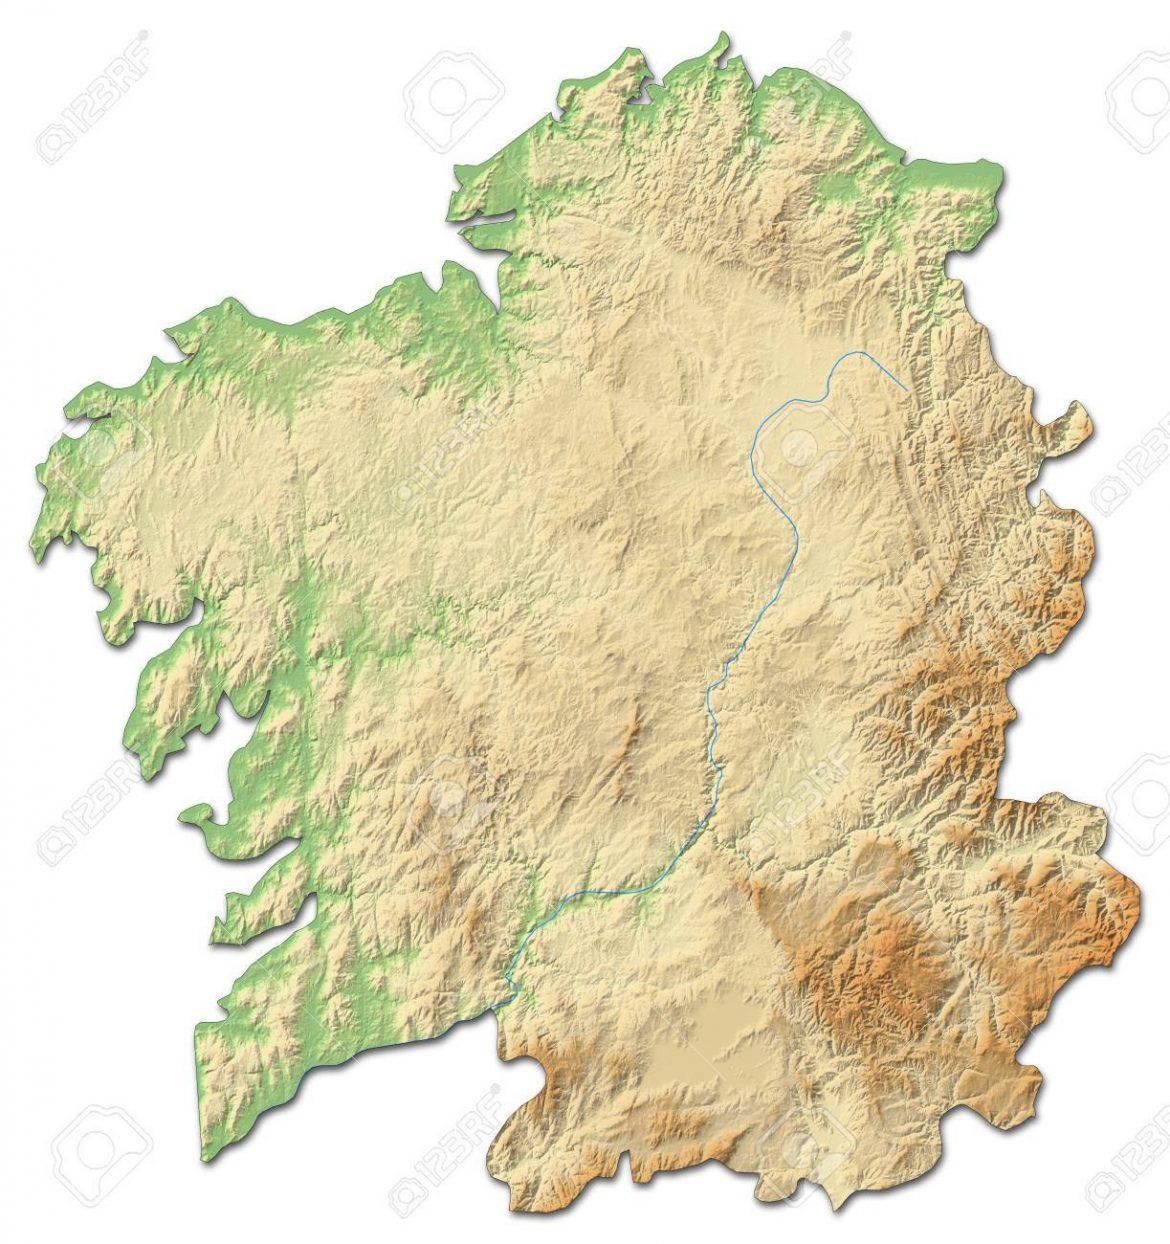 Mapas de galicia para imprimir, masquelibros